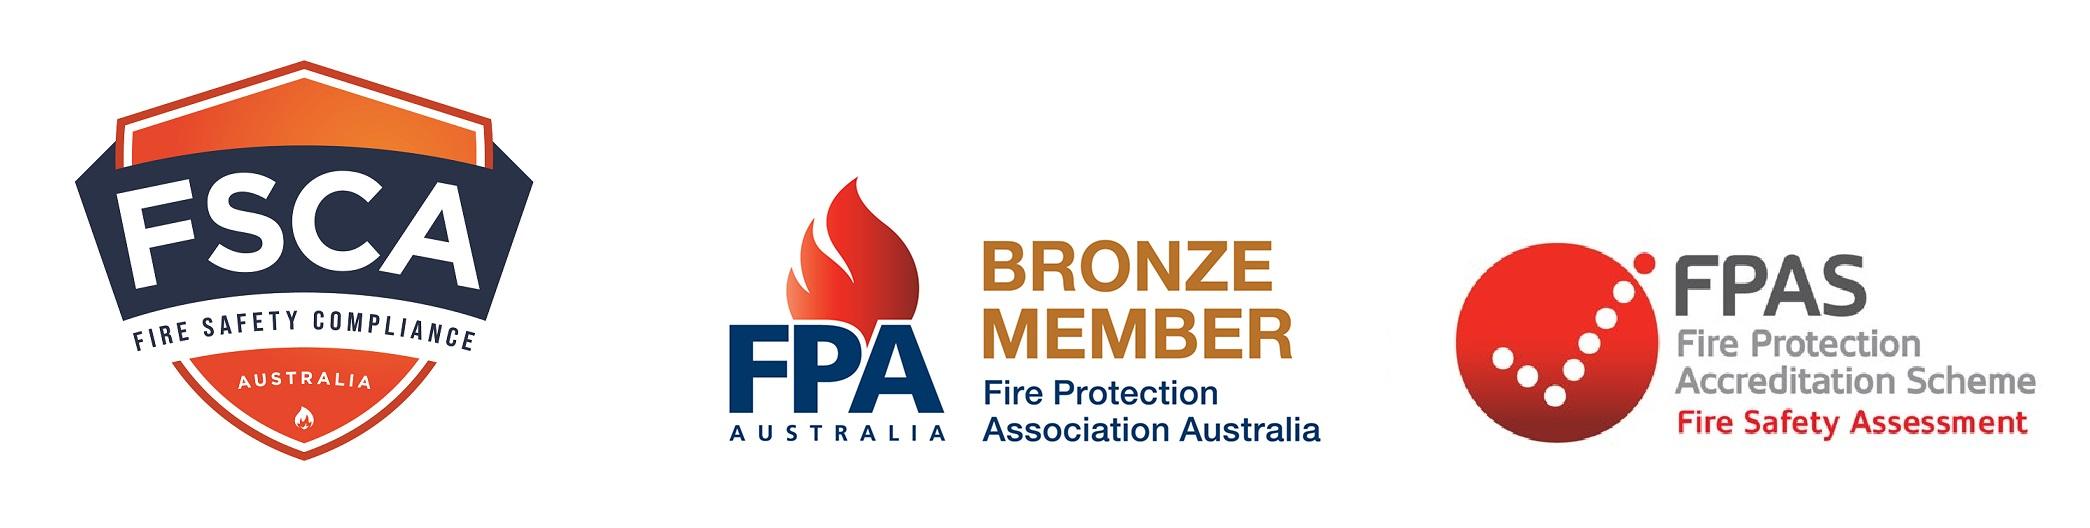 Fire Safety Compliance Australia